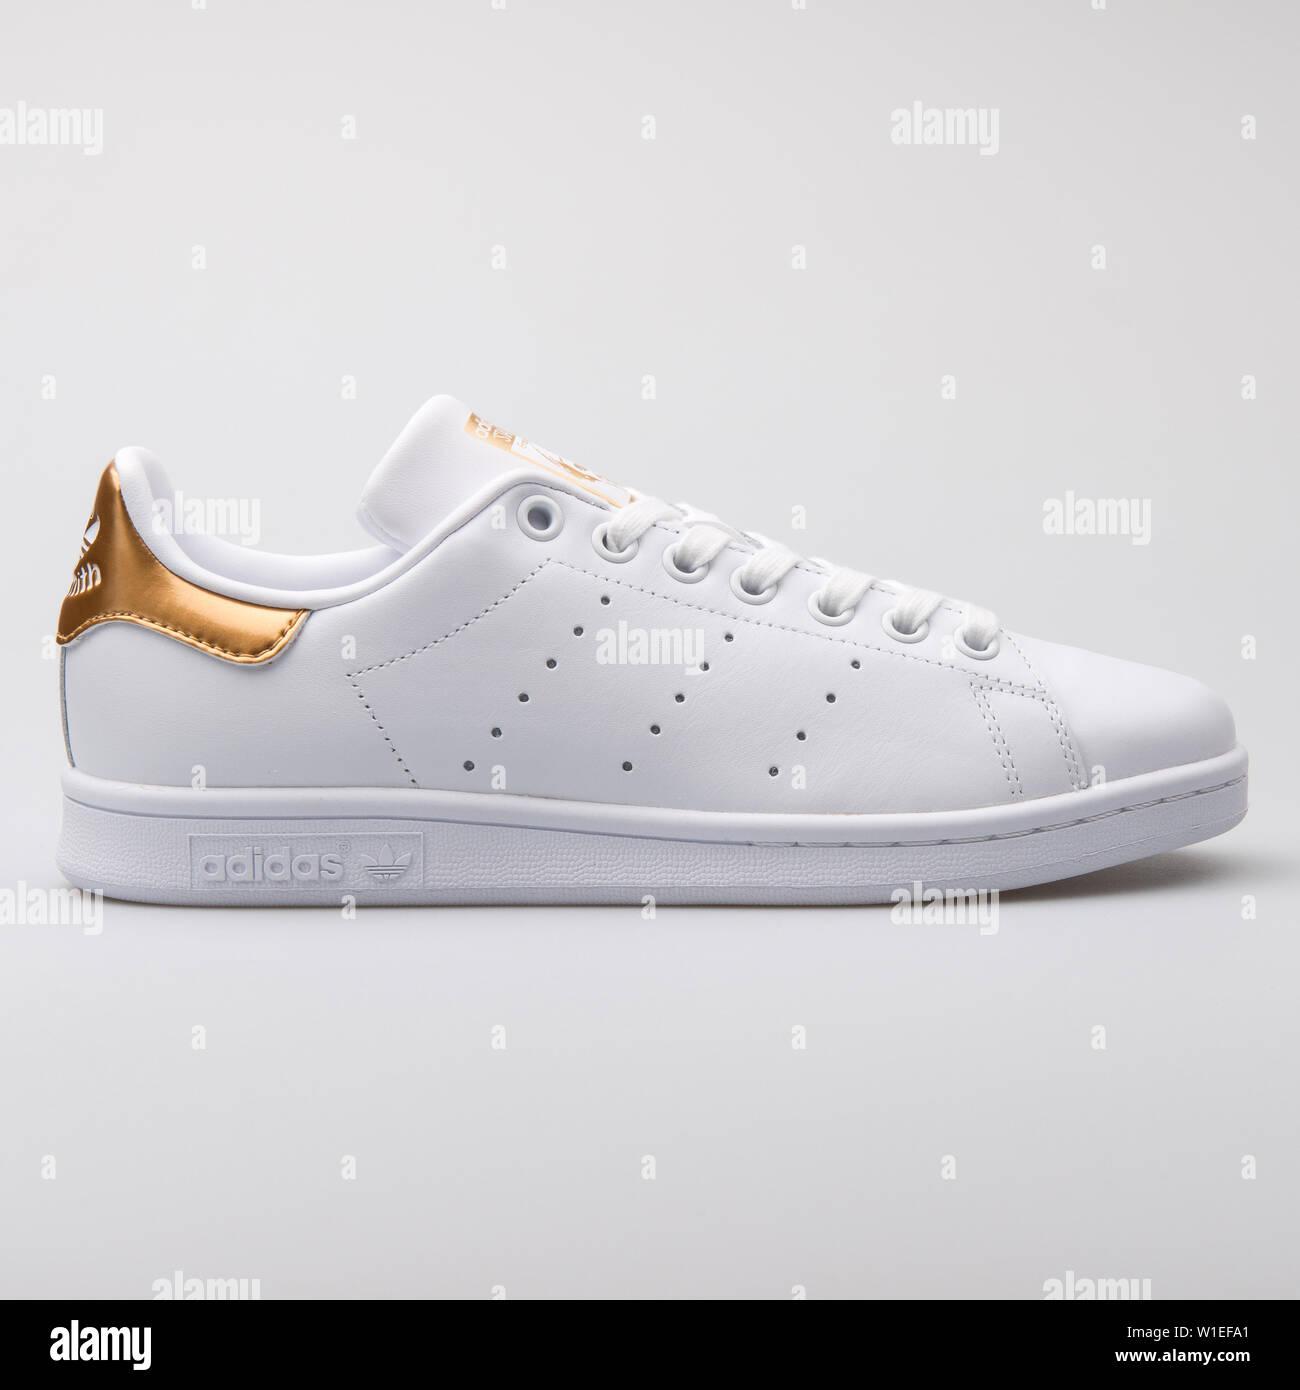 new concept 23025 c2b6b VIENNA, AUSTRIA - AUGUST 7, 2017: Adidas Stan Smith white ...